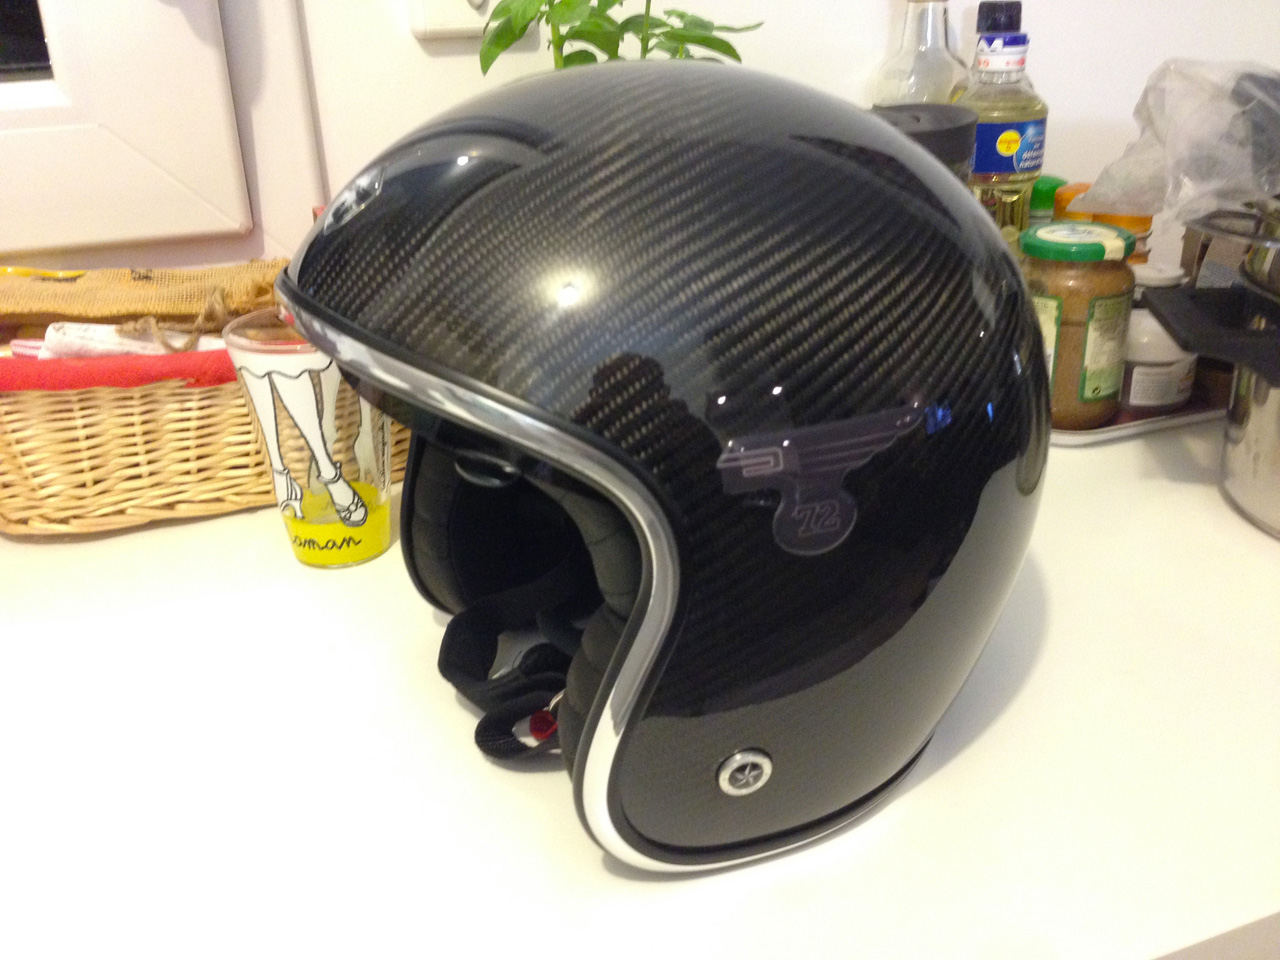 Casque moto Jet : marque GPA